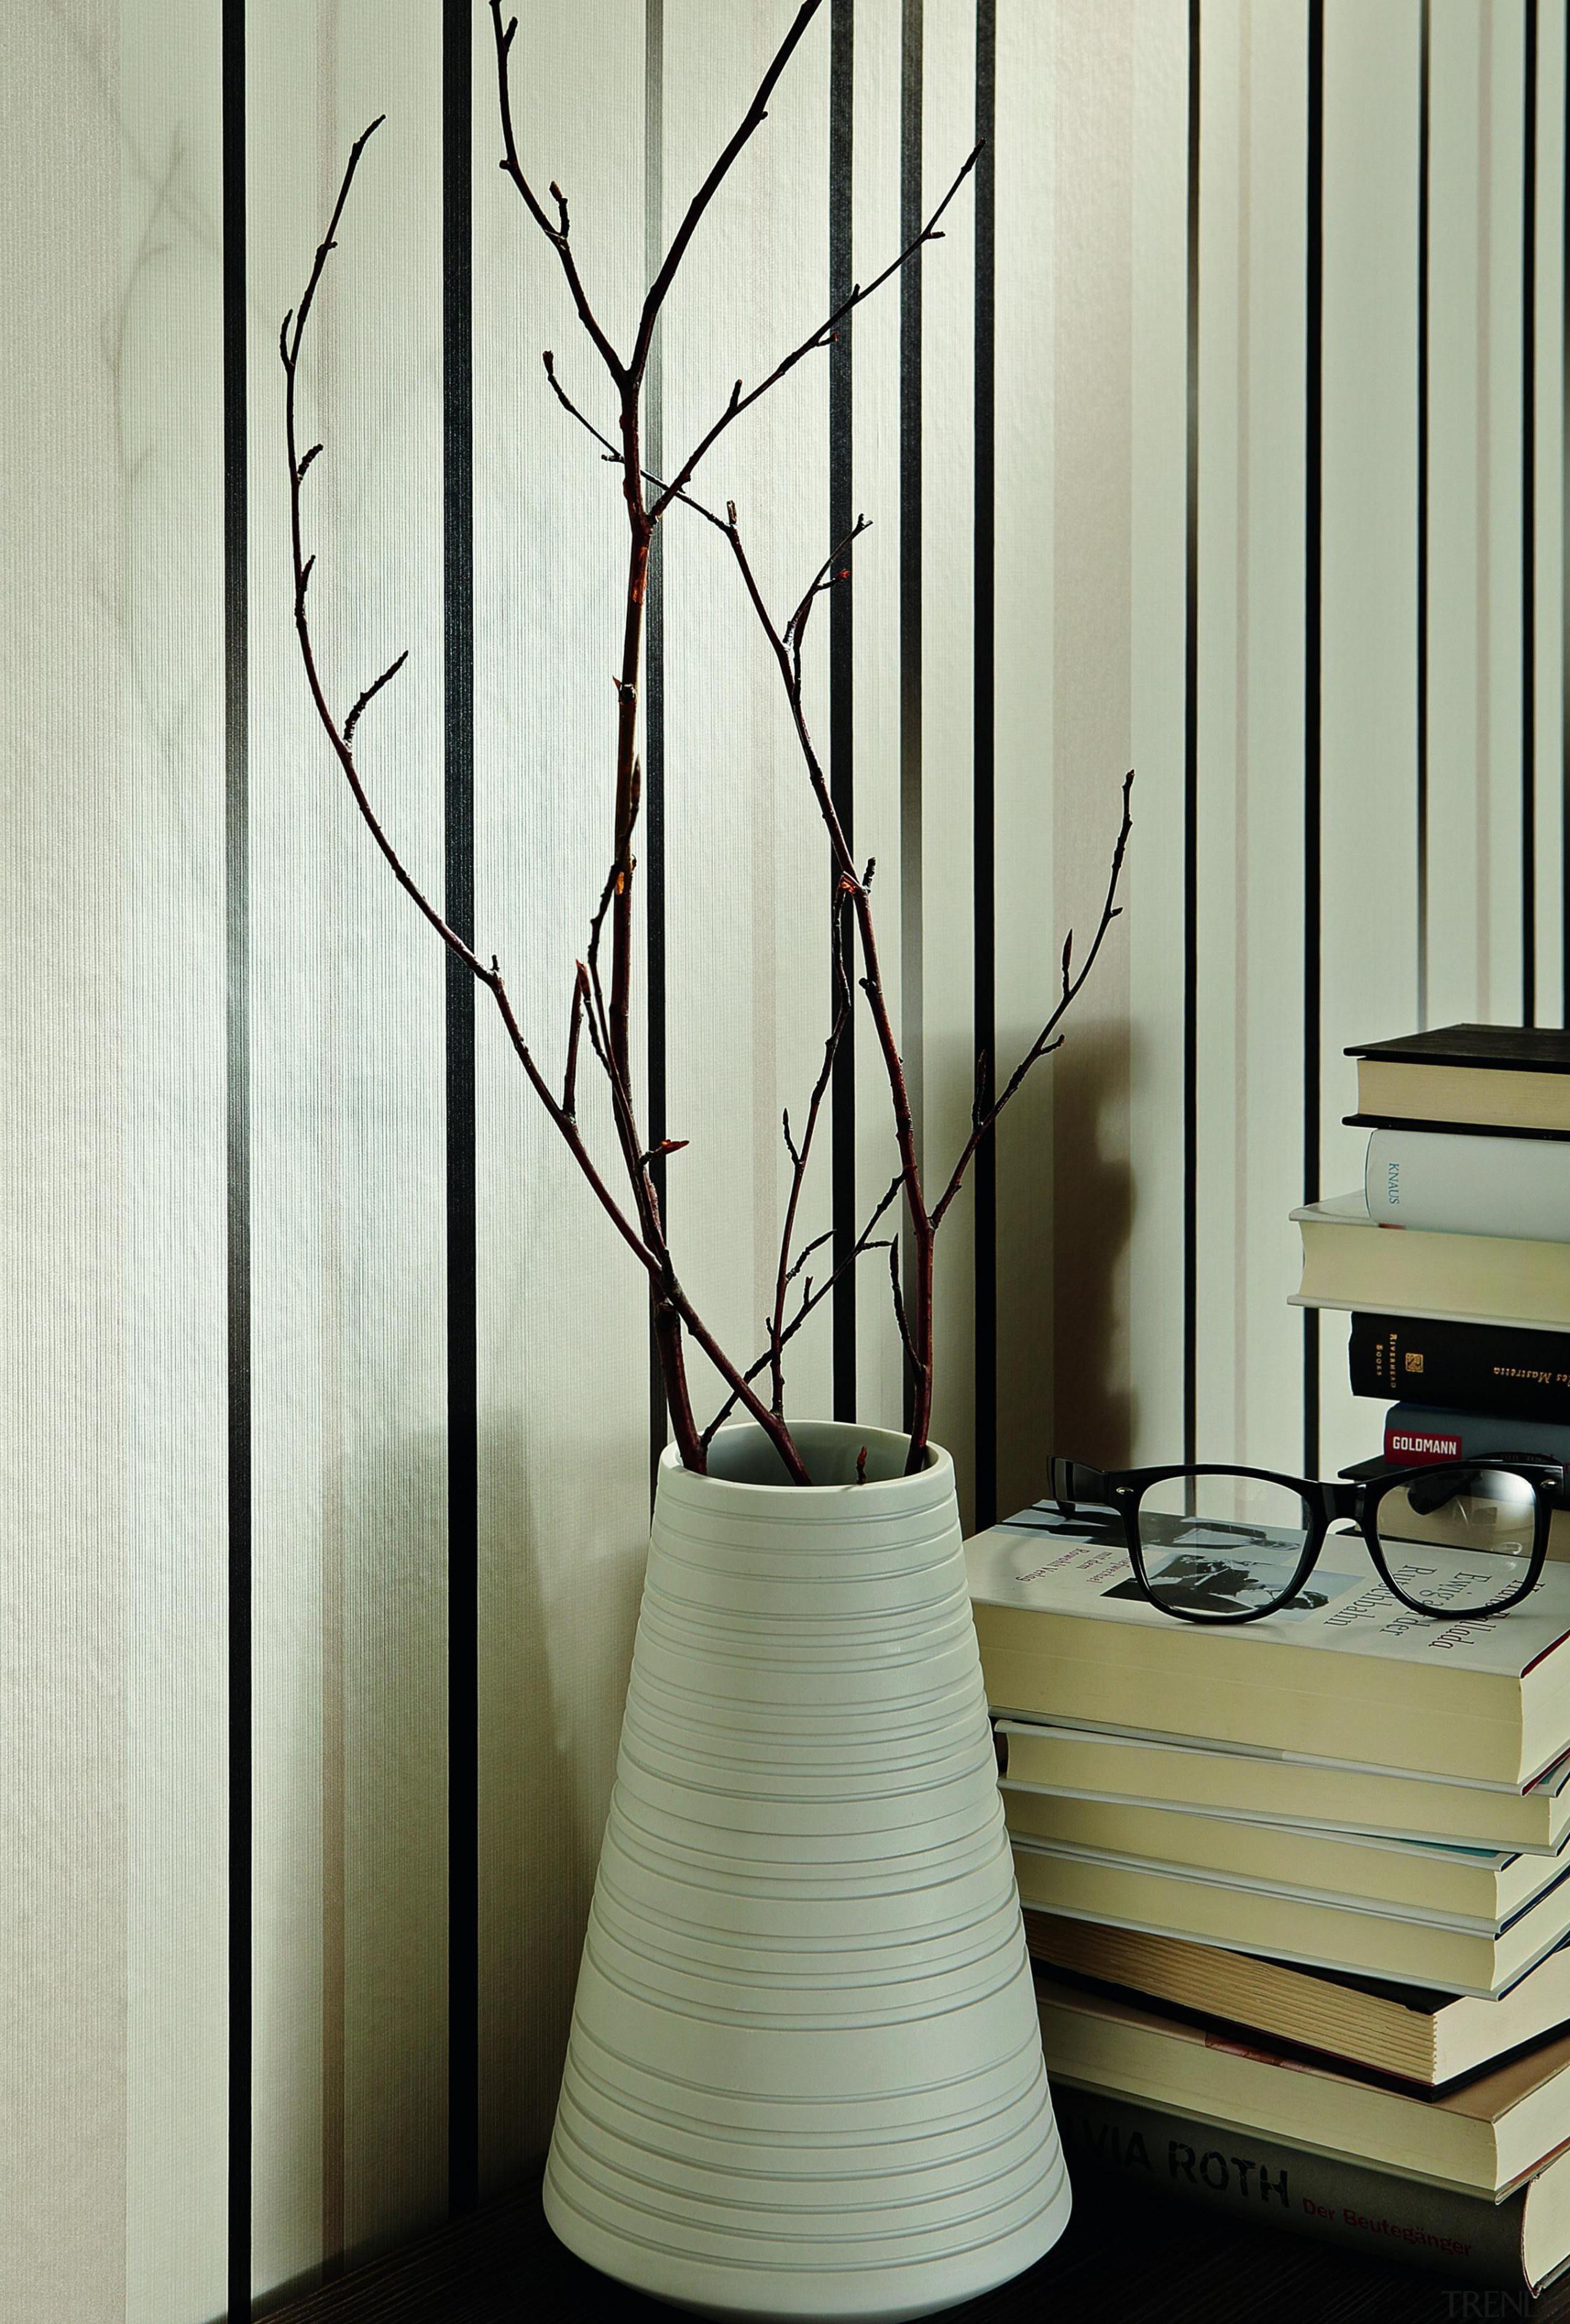 Chicago Range - Chicago Range - branch | branch, flowerpot, furniture, interior design, lamp, light fixture, lighting accessory, product design, table, twig, vase, gray